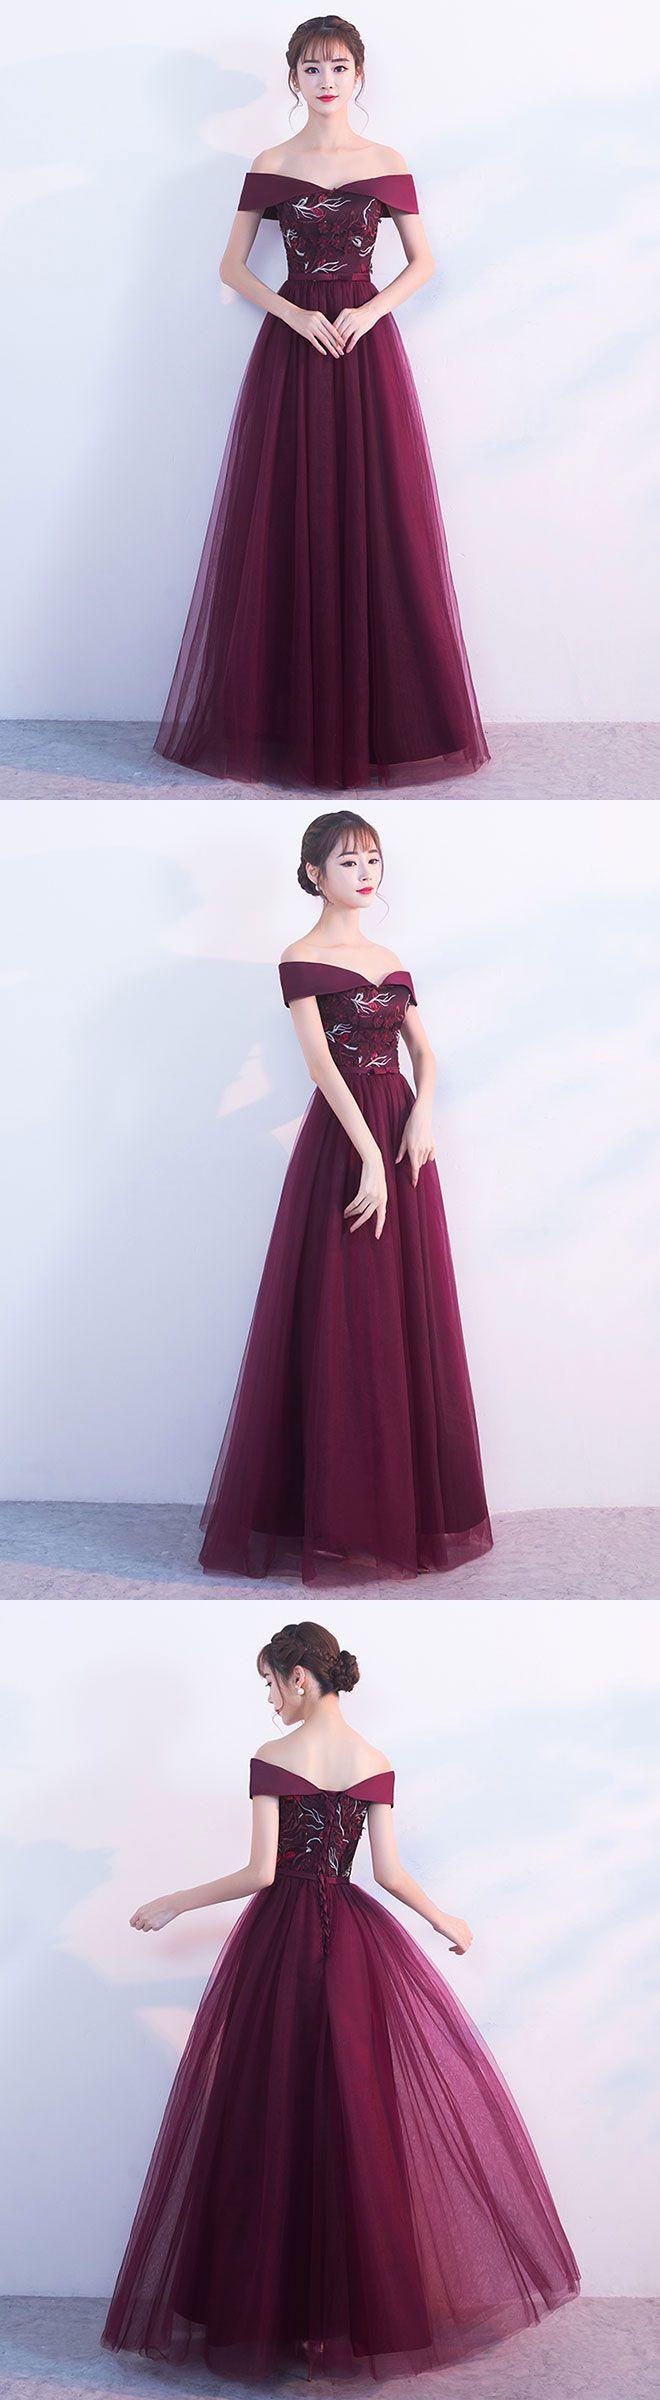 Burgundy long prom dress burgundy evening dress long prom dresses